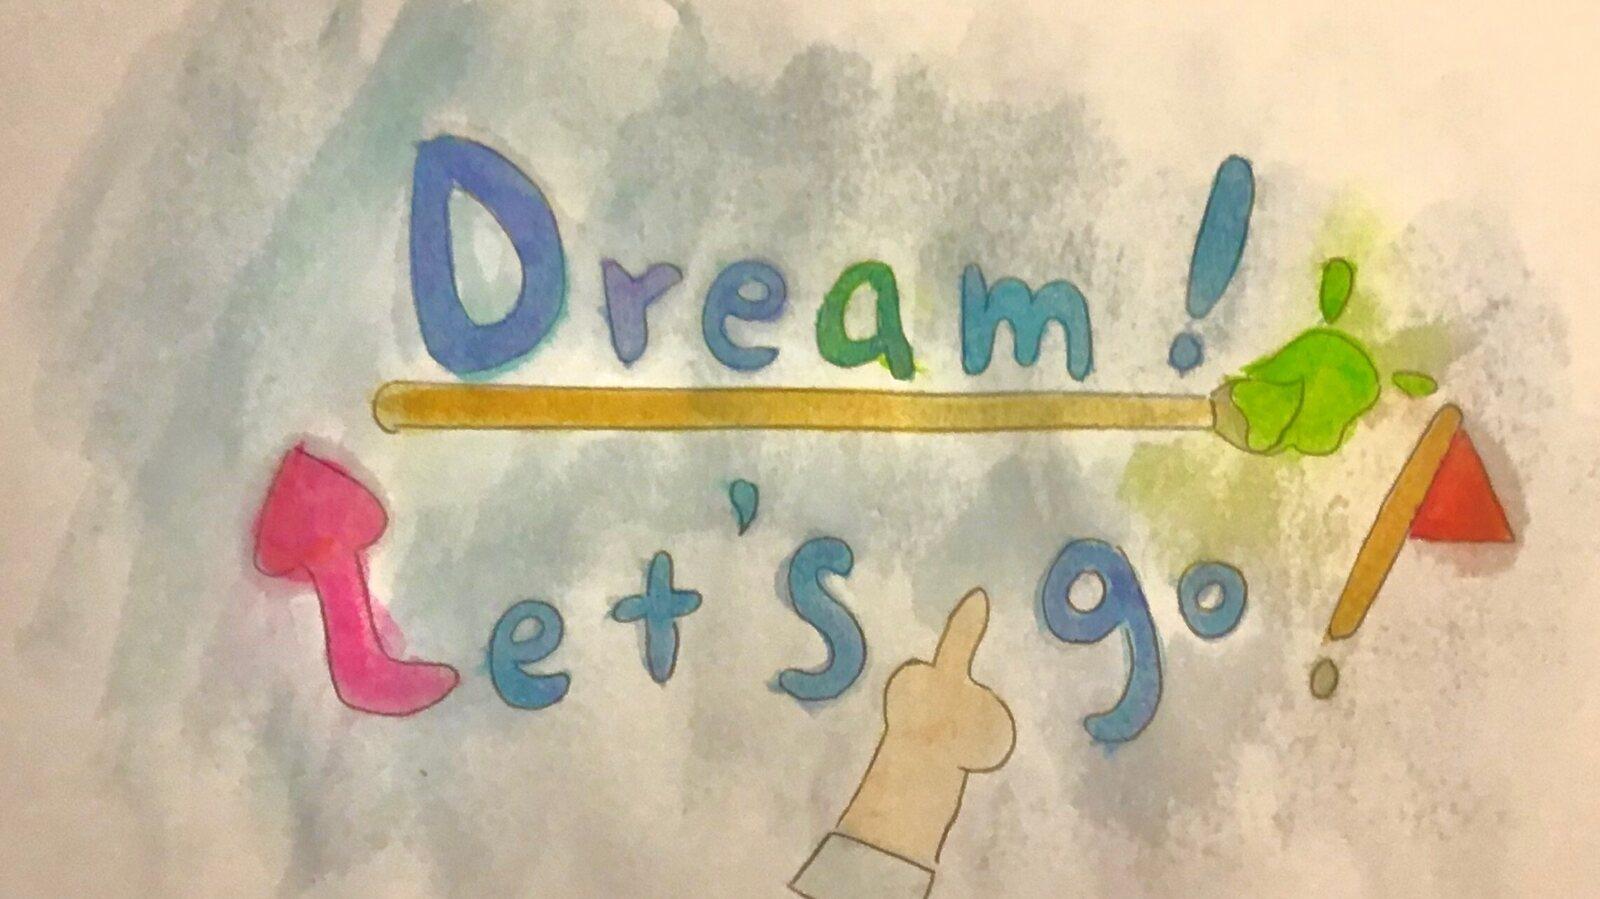 Dream! Let's go!